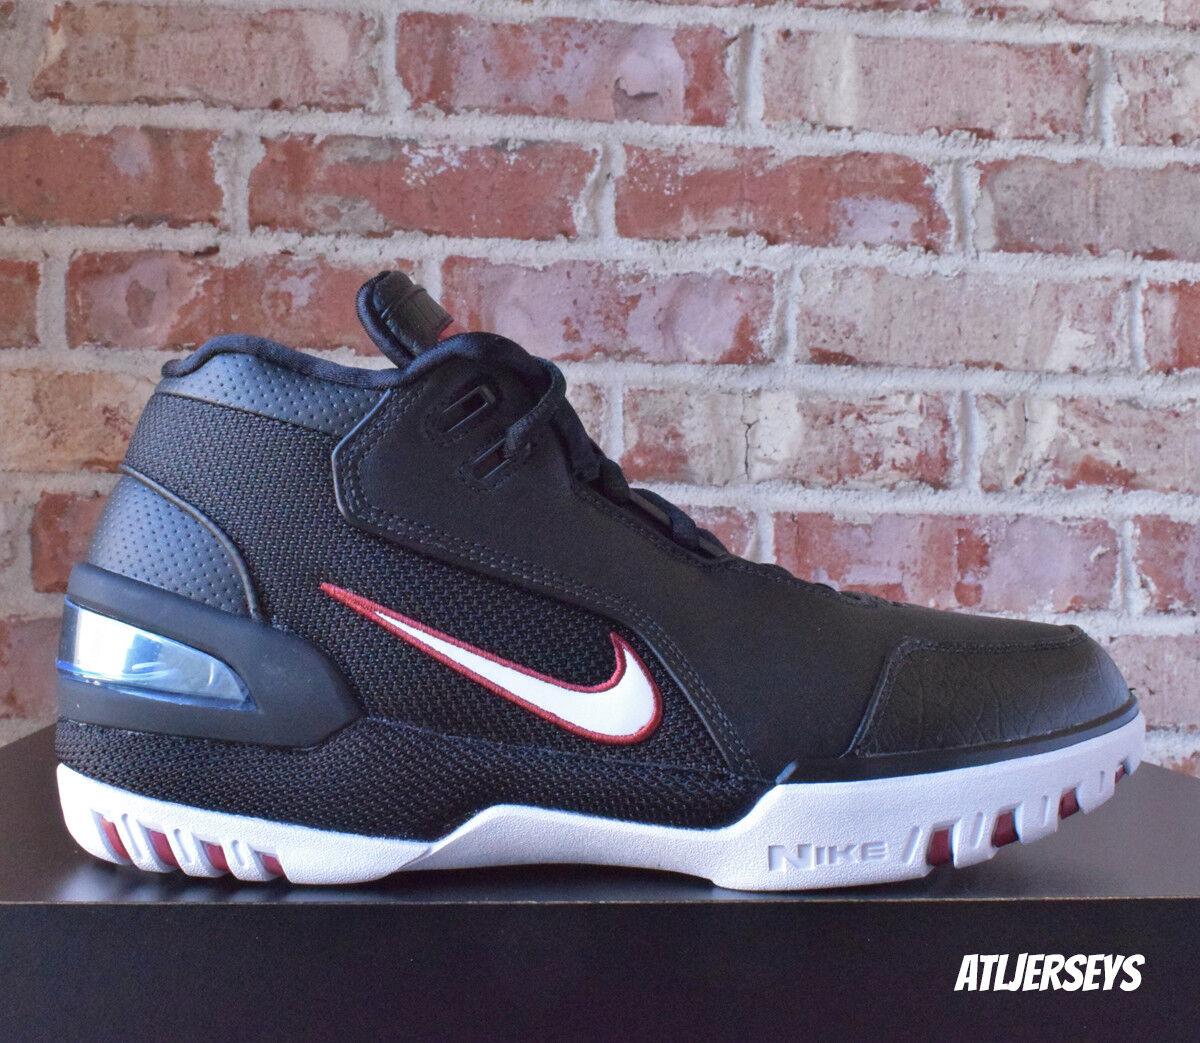 Nike Nike LeBron LeBron LeBron Hombre 12 Hombre US zapatos  Talla En venta 1b10d3